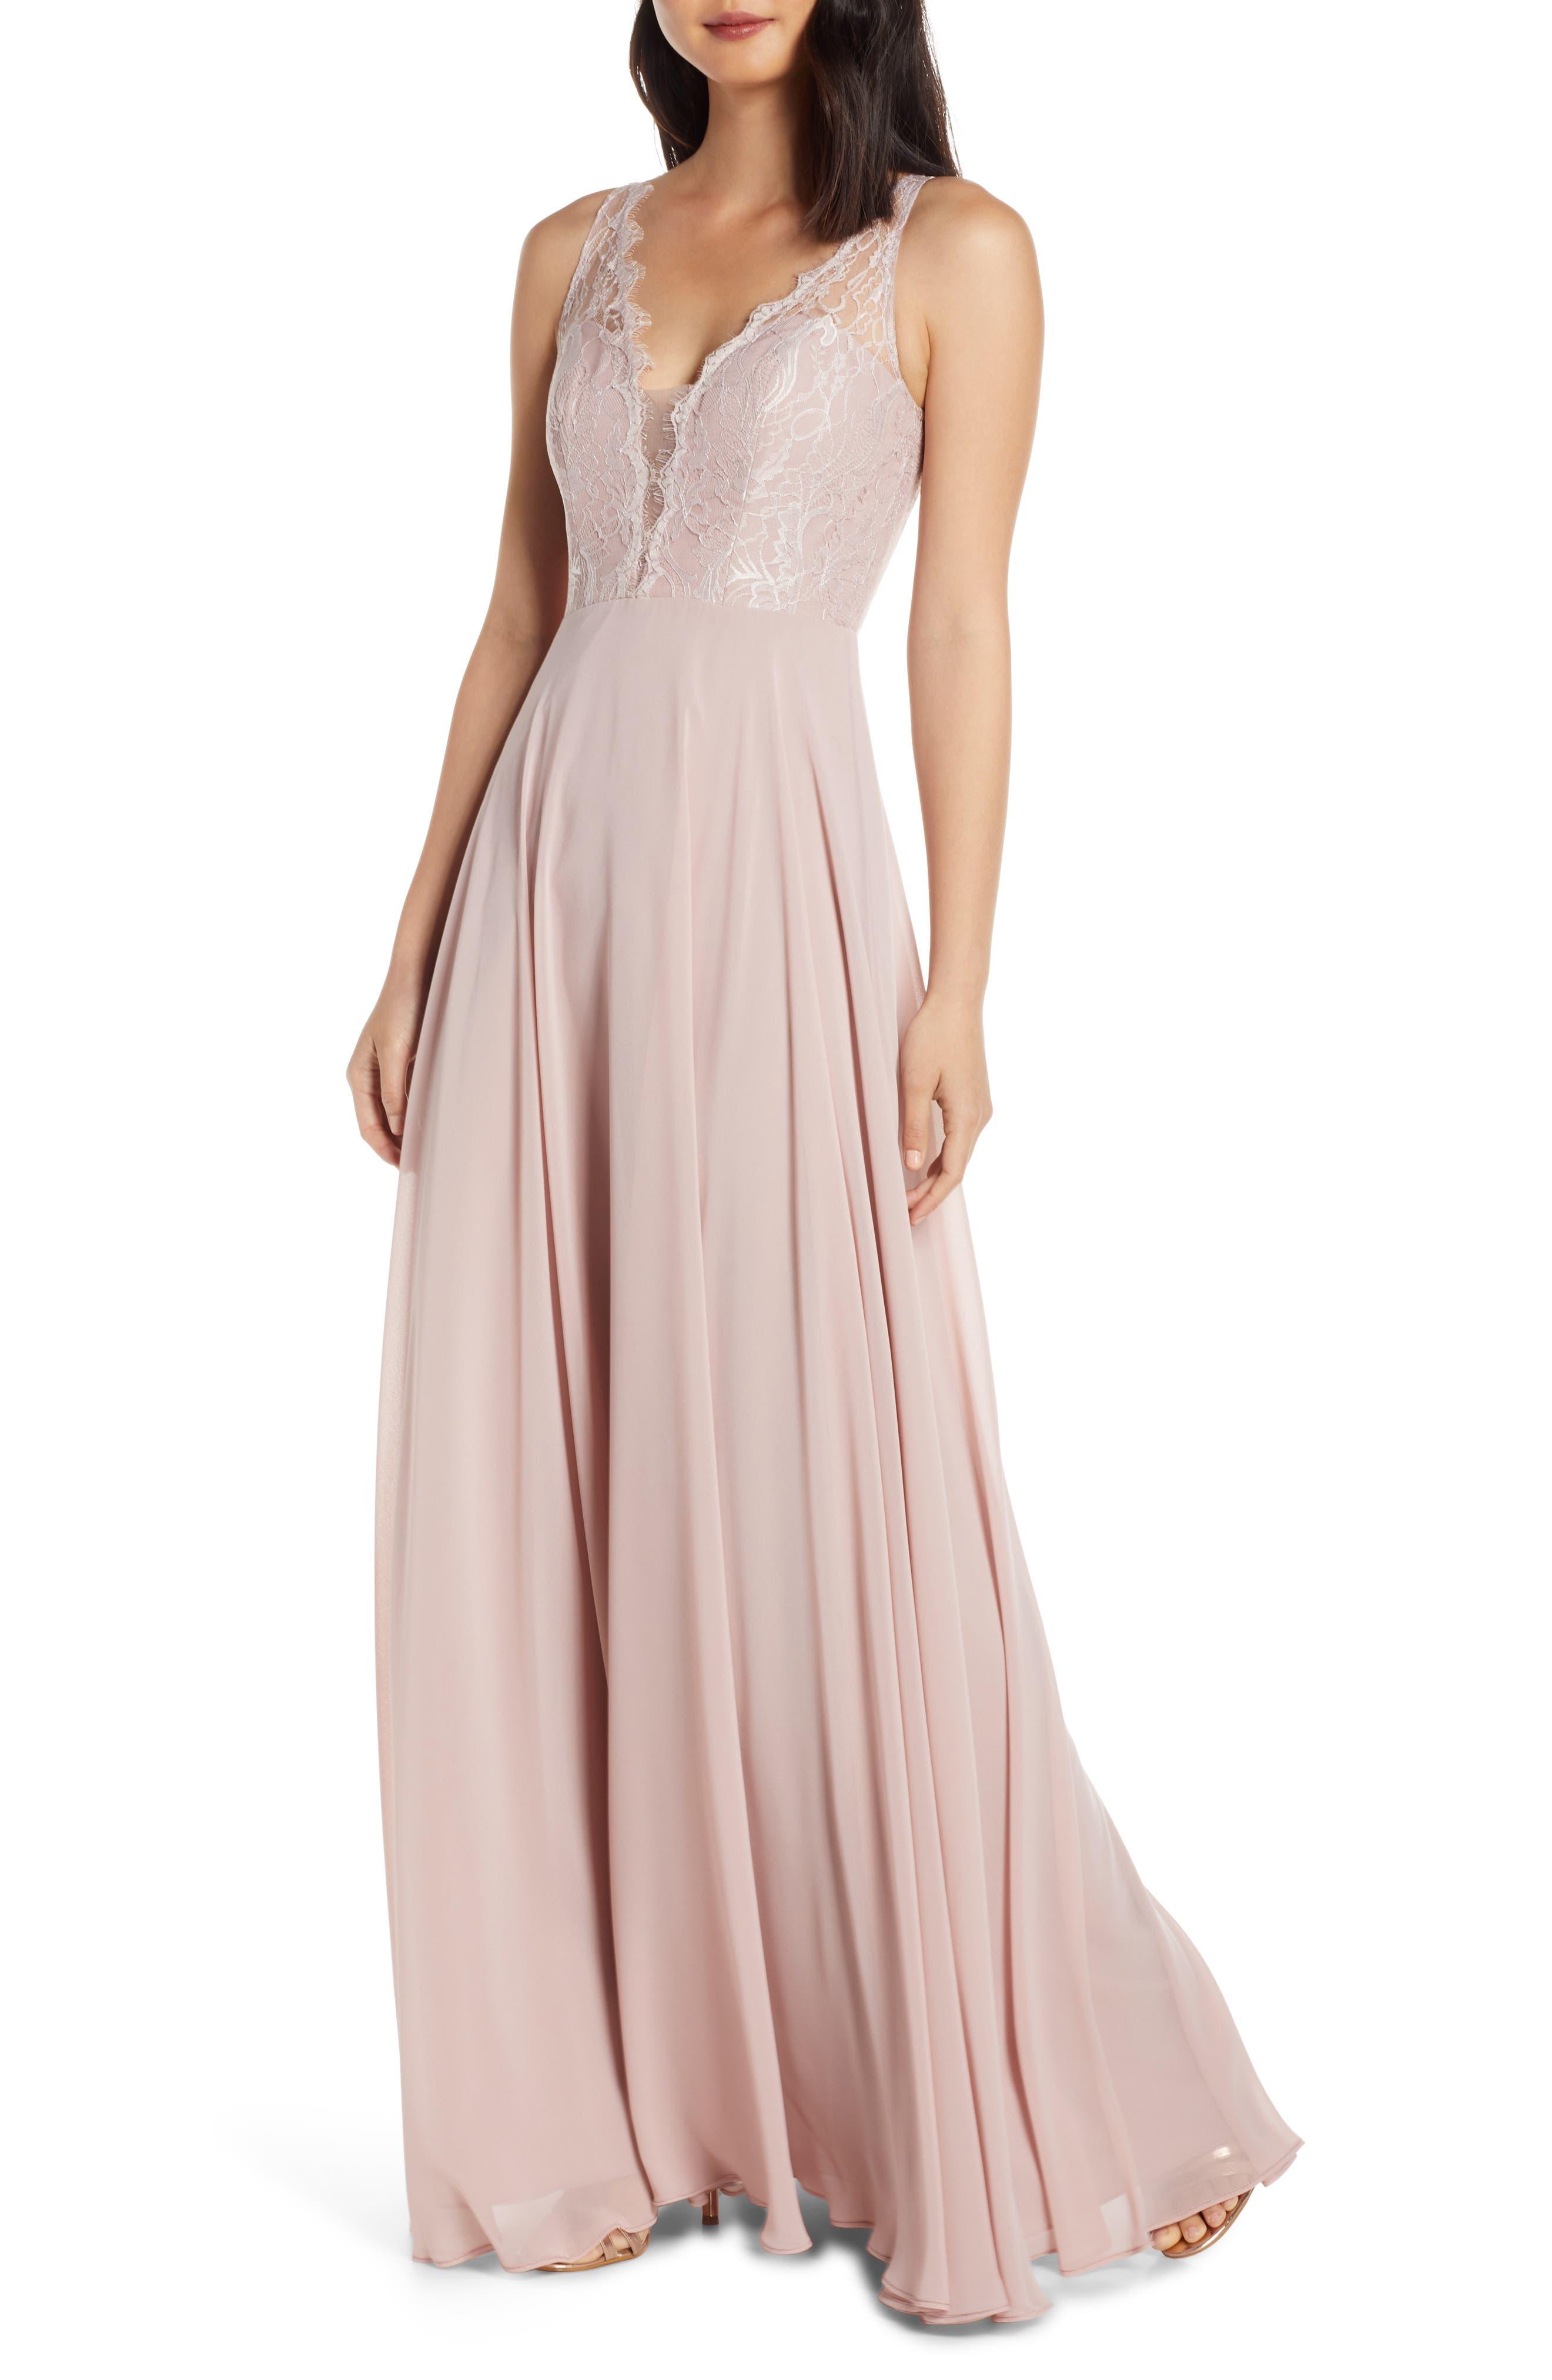 Hayley Paige Occasions Lace Bodice Chiffon Evening Dress, Pink